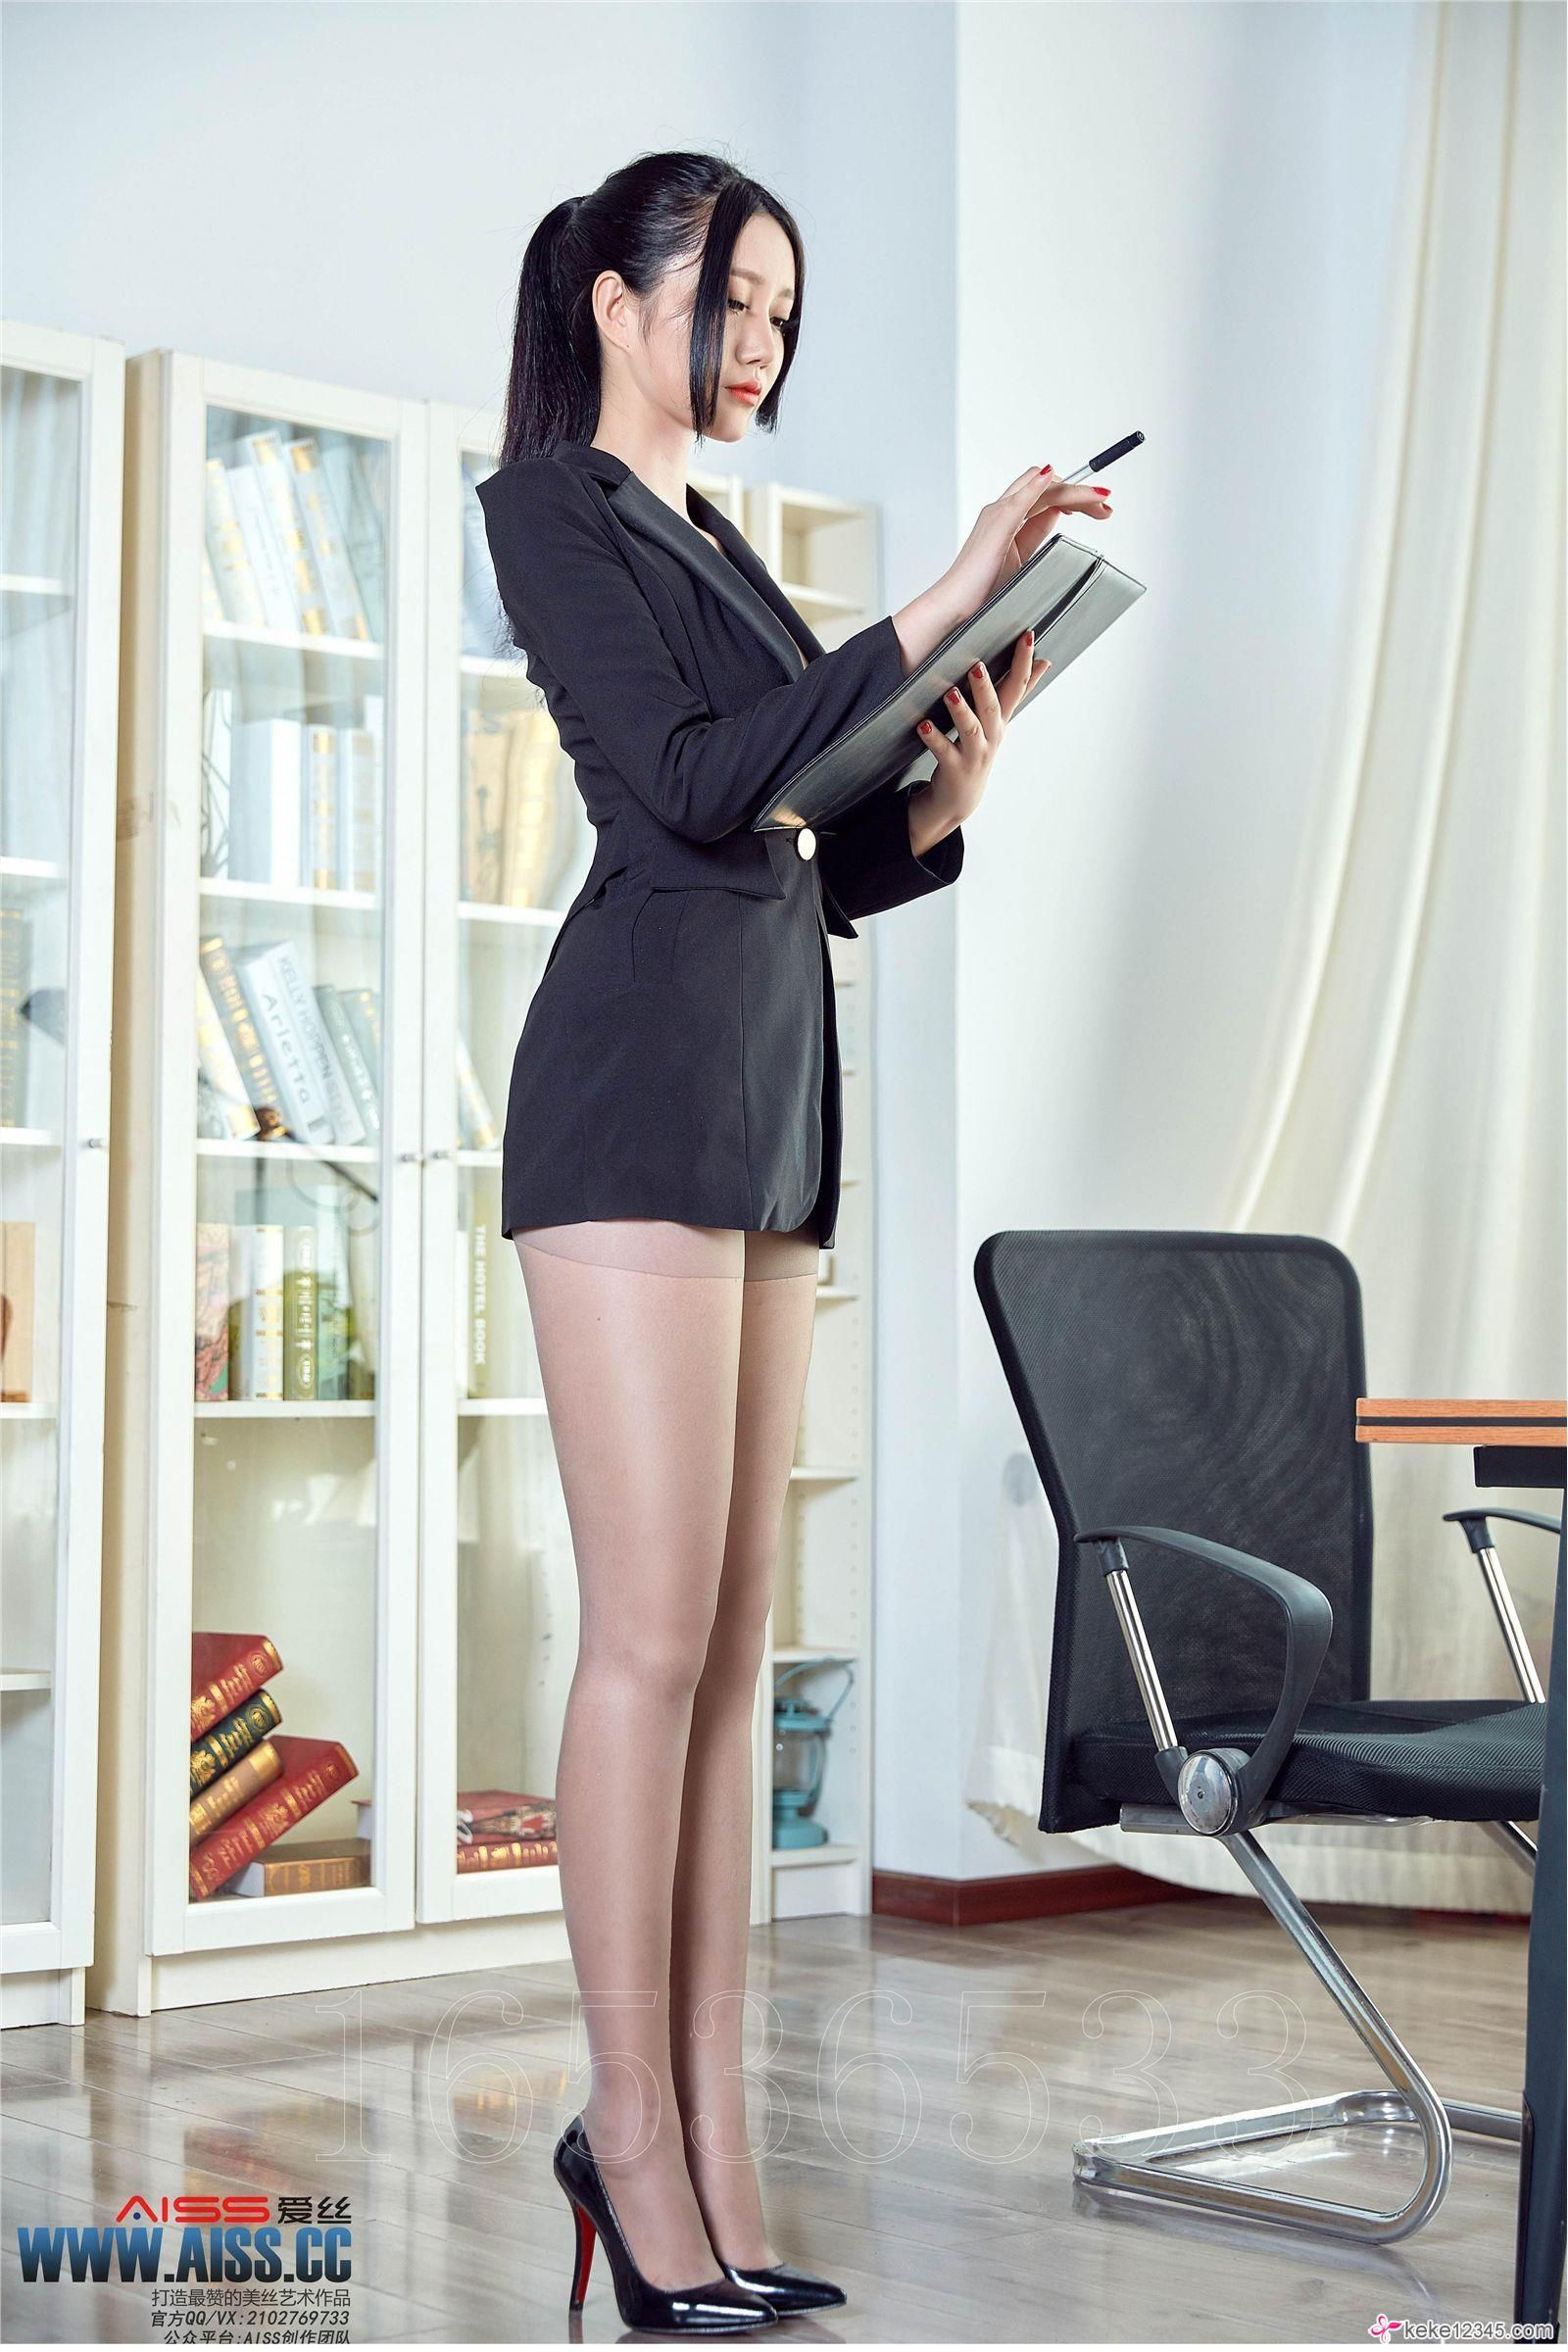 [AISS爱丝]丝袜美腿外拍 No.TR010 严佳丽 爱穿裤袜的上司 OL女郎 | sexy ...